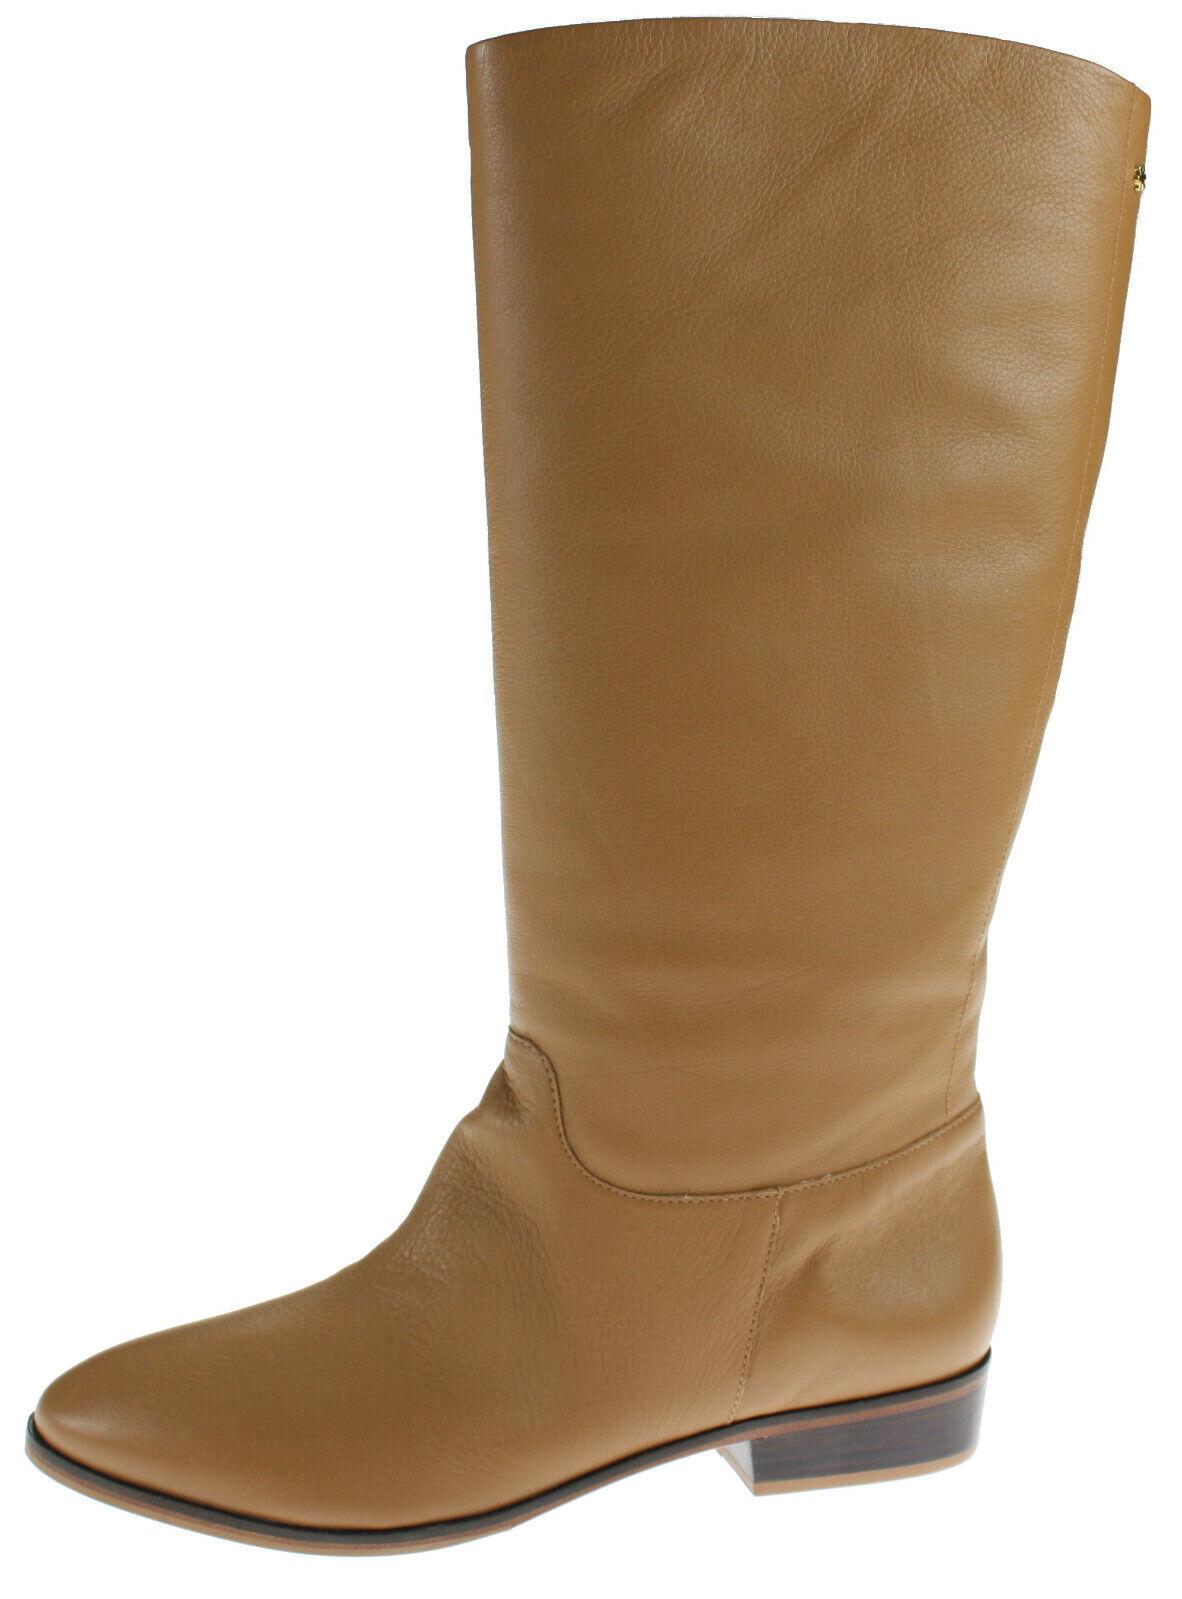 FlipFlop Damen Leder Stiefel Nicolette, Größe 42, Camel, NEU